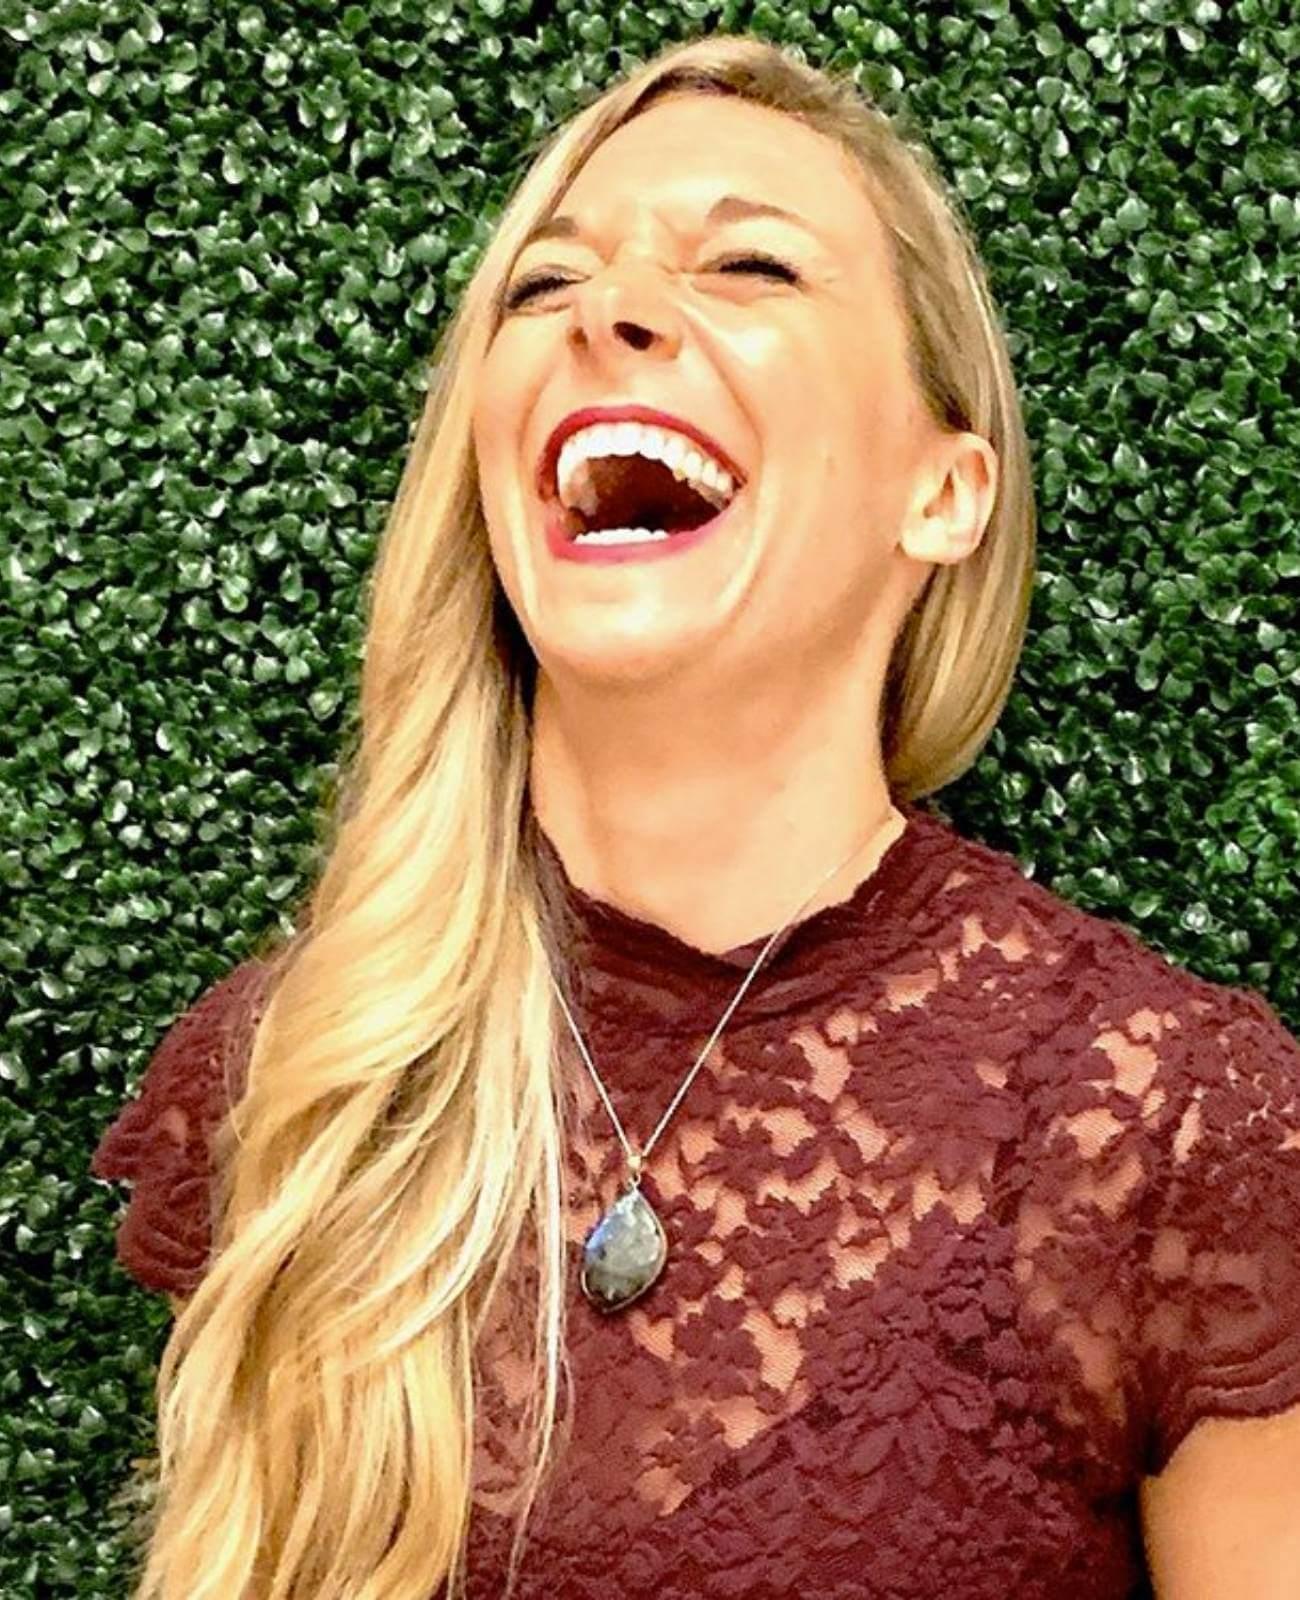 Blonde woman in fancy maroon shirt laughing